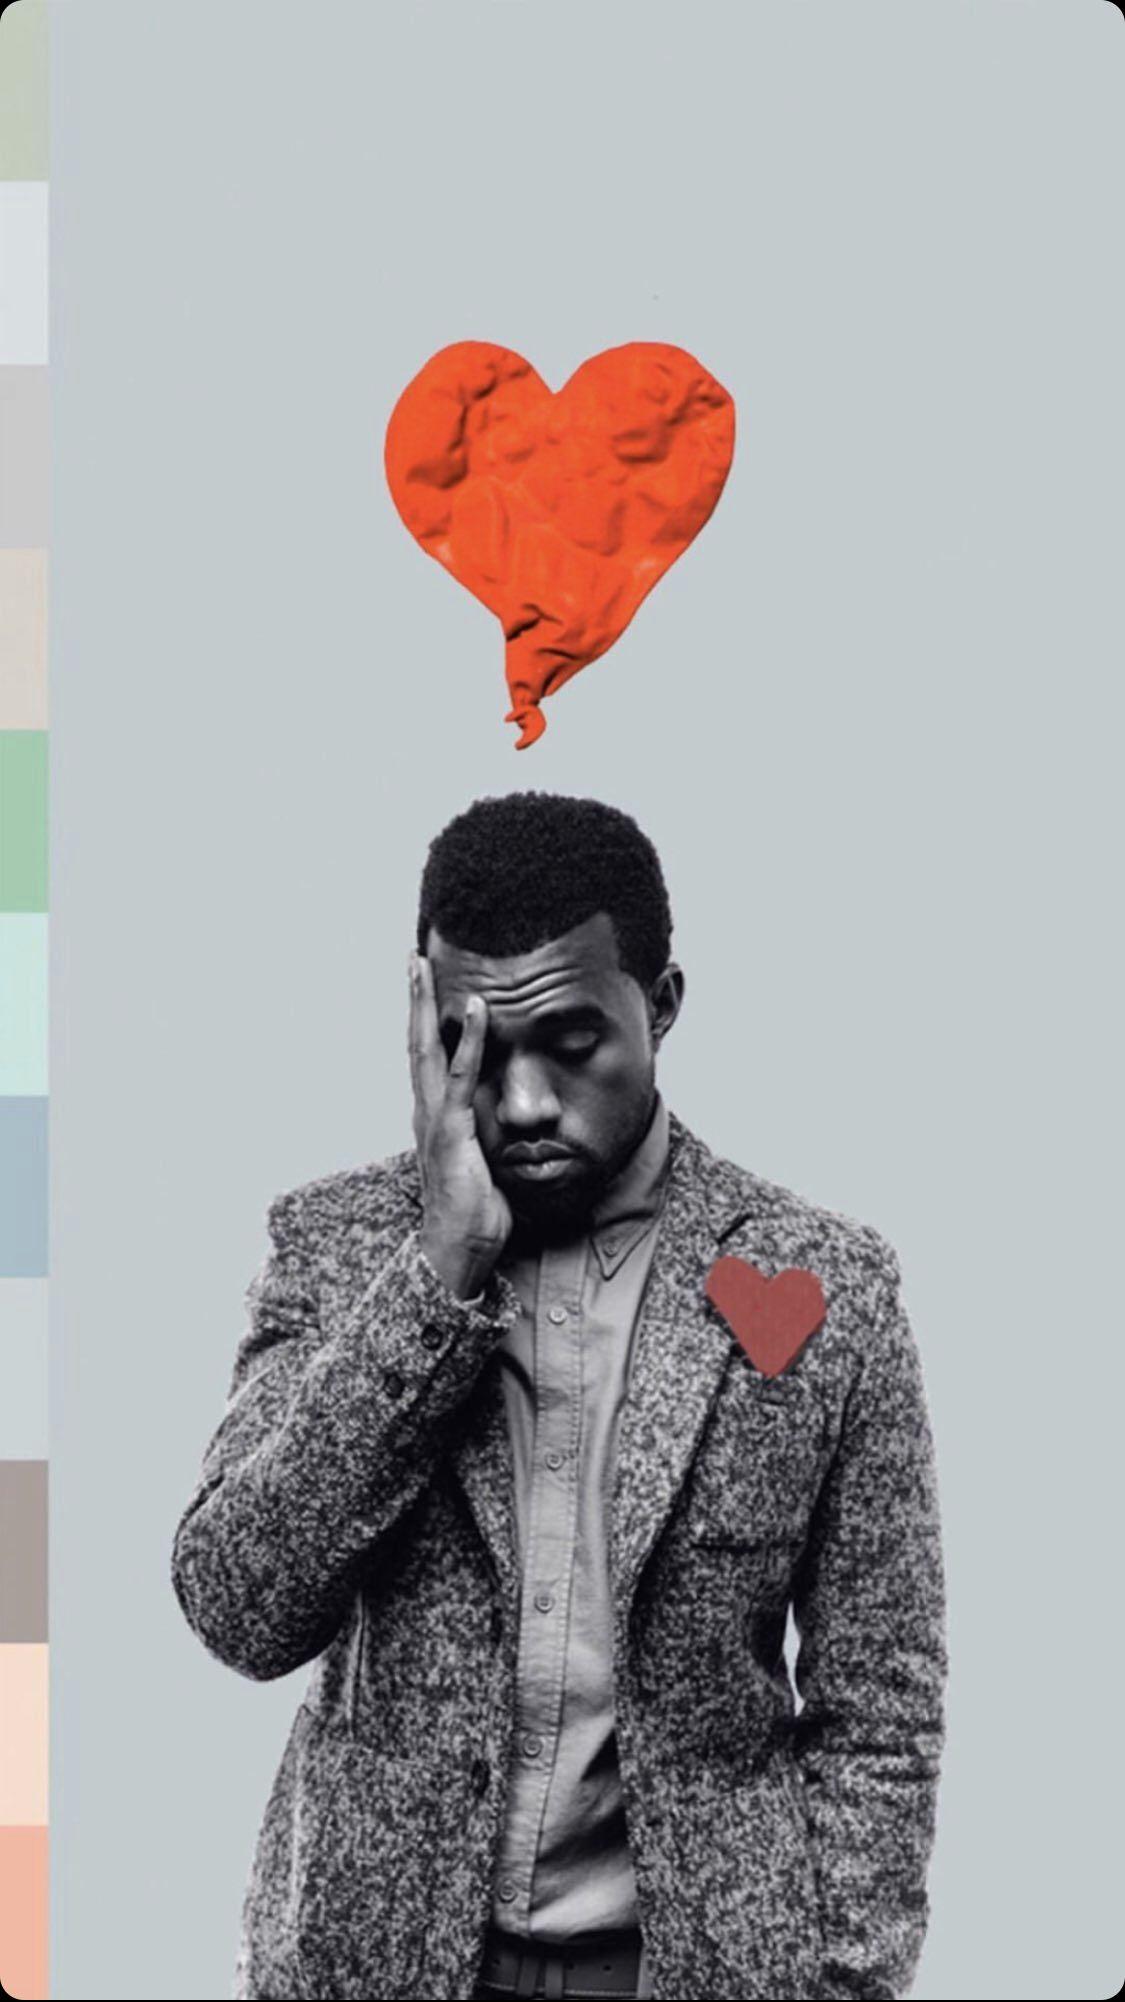 Pin By Jon Francois On Phone Wallpaper In 2020 Kanye West Tattoo Heartbreak Art Music Album Art